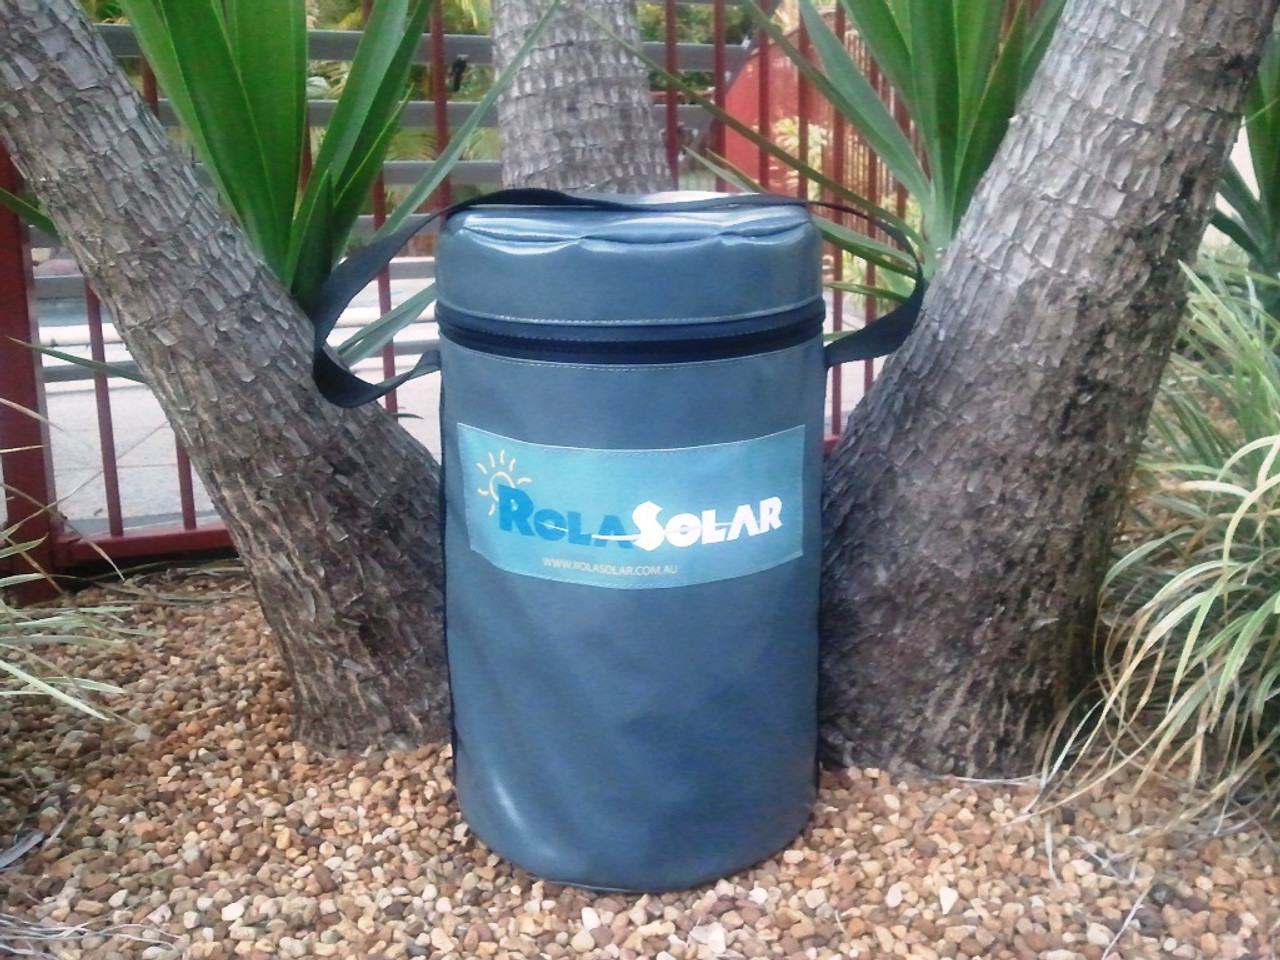 Rolasolar 50 Watt Rollable Flexible Solar Charge Kit